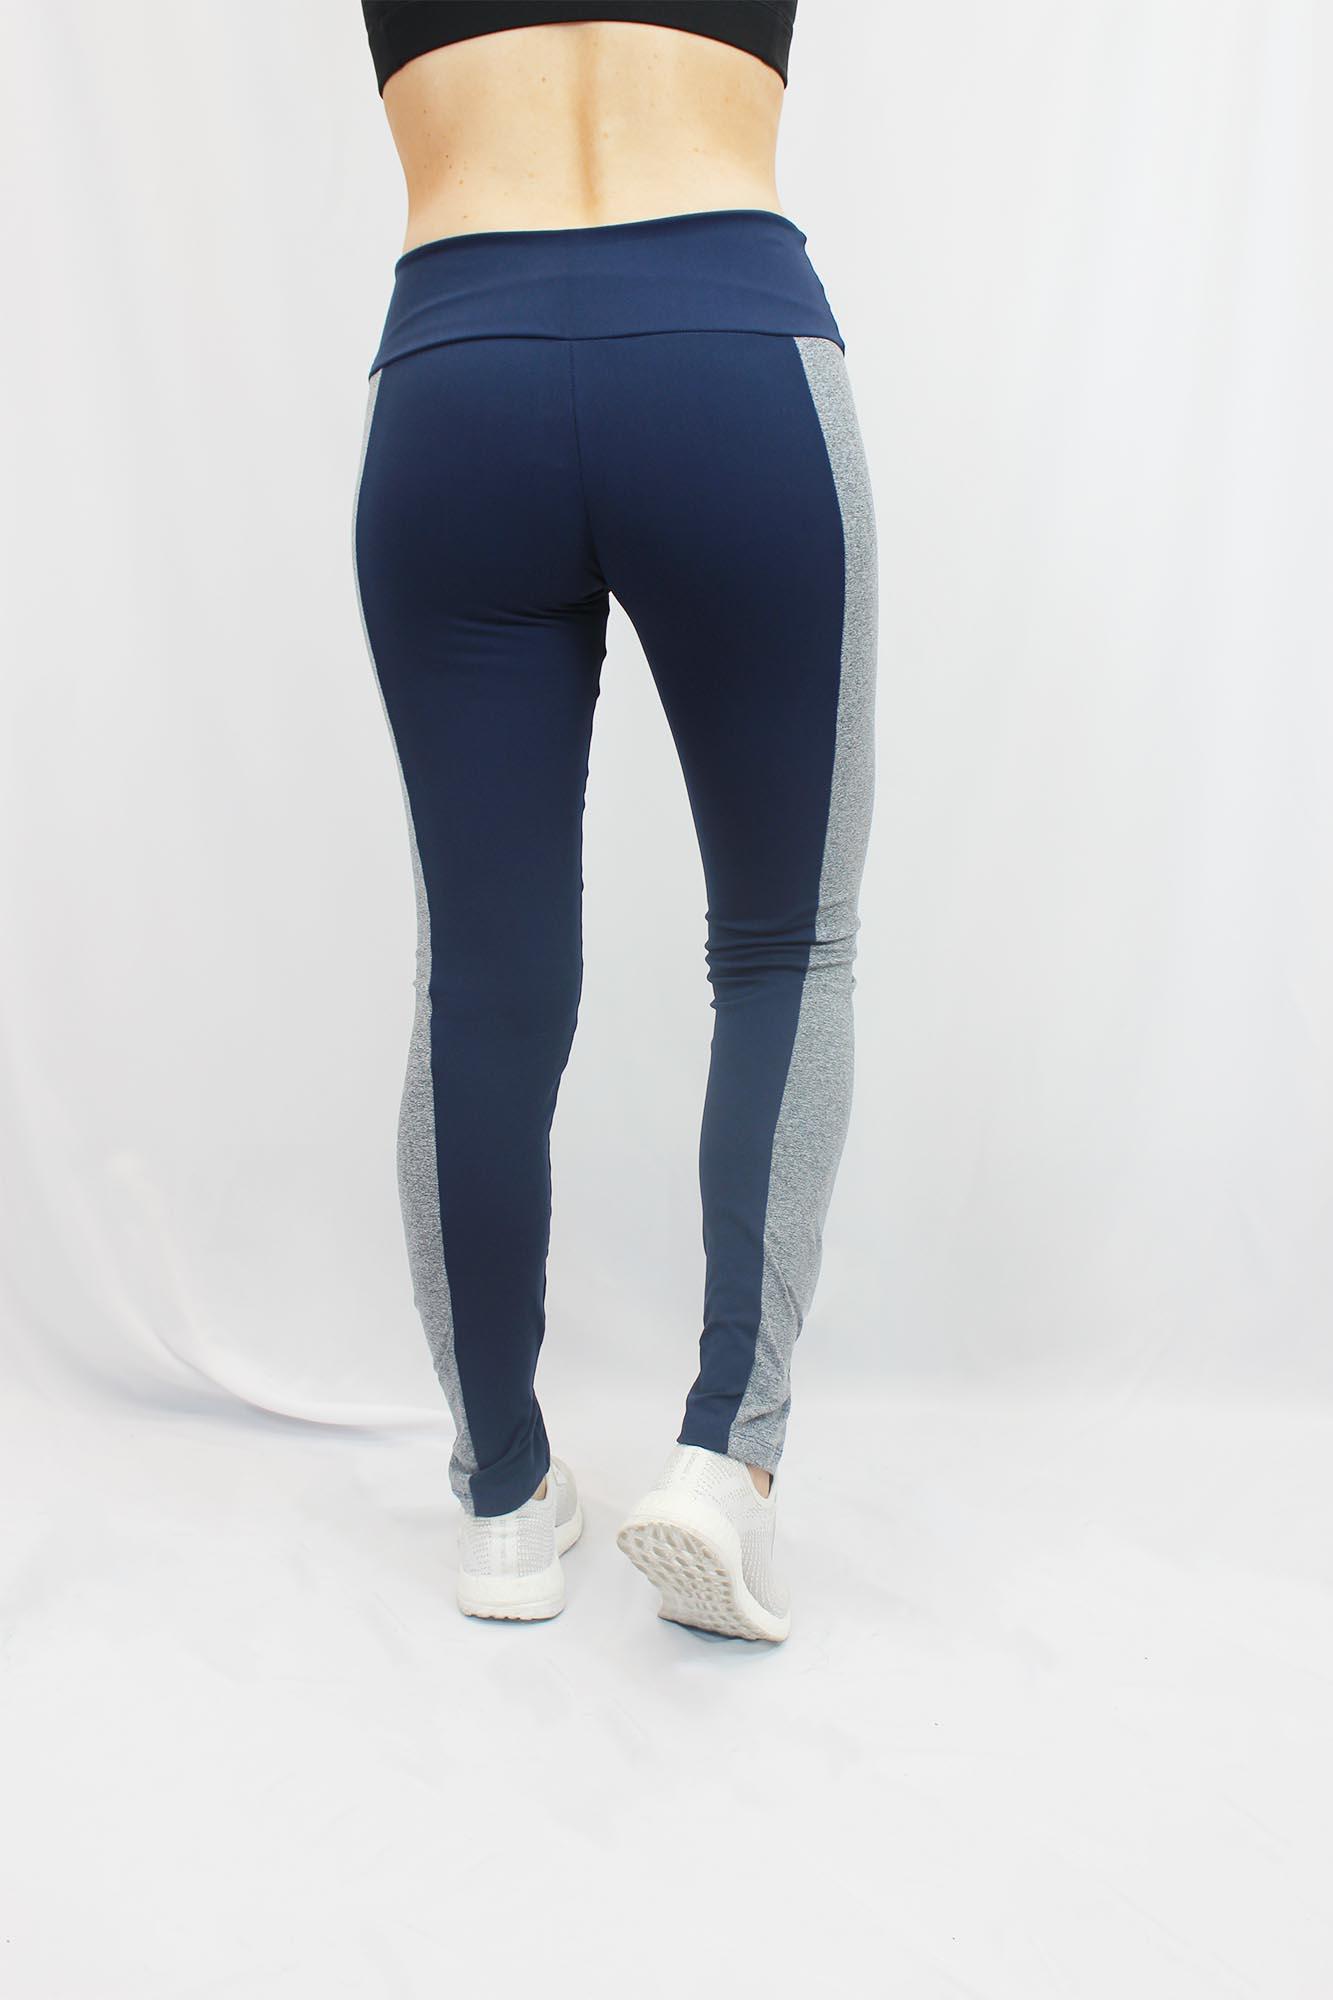 Calça Legging Mesclada Feminina - Azul Marinho